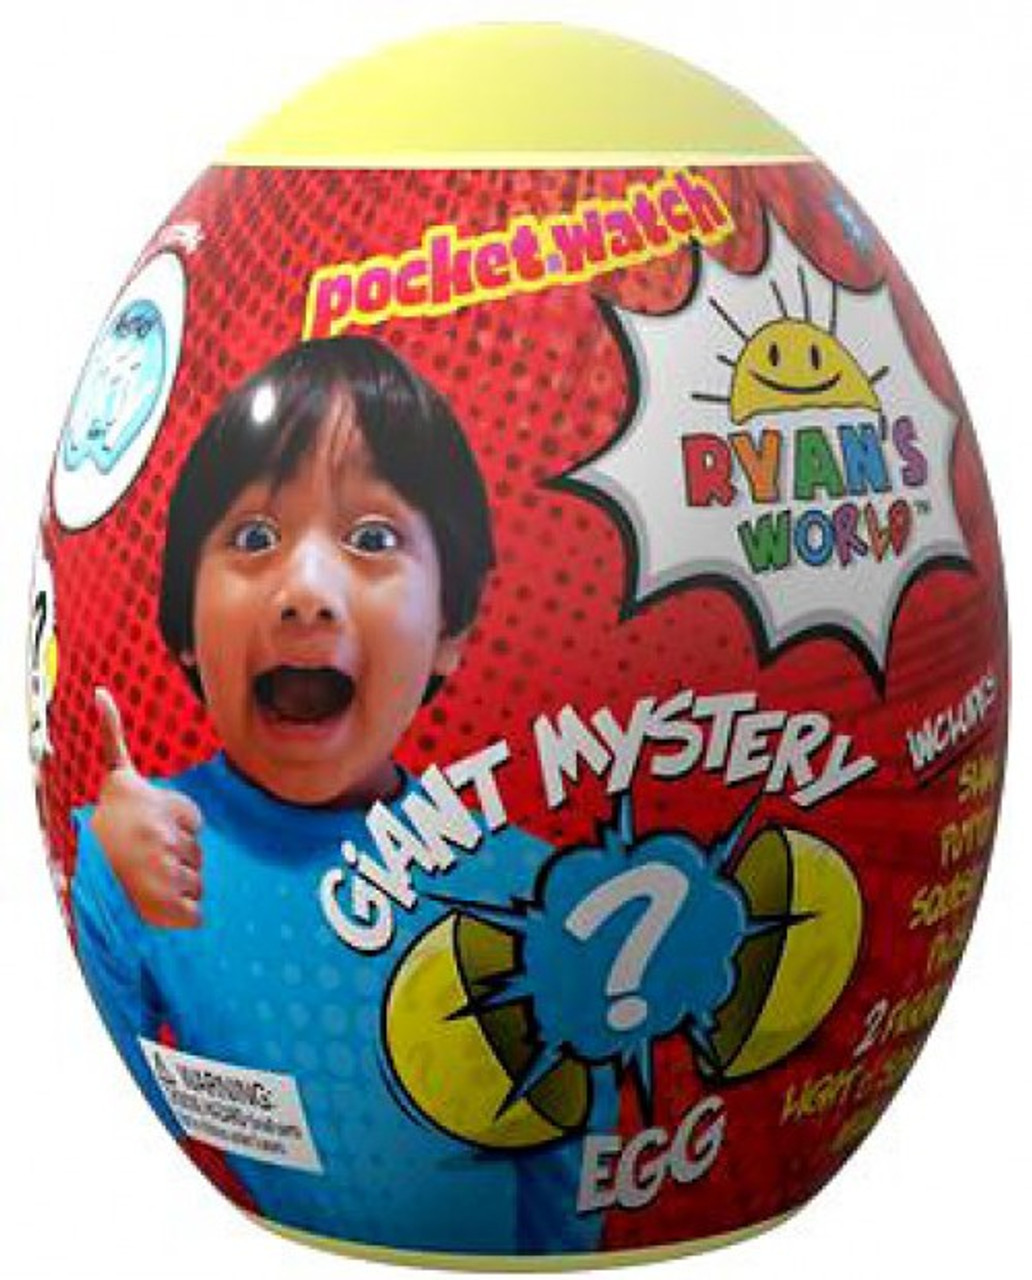 Ryans World Surprise Mystery Egg Red